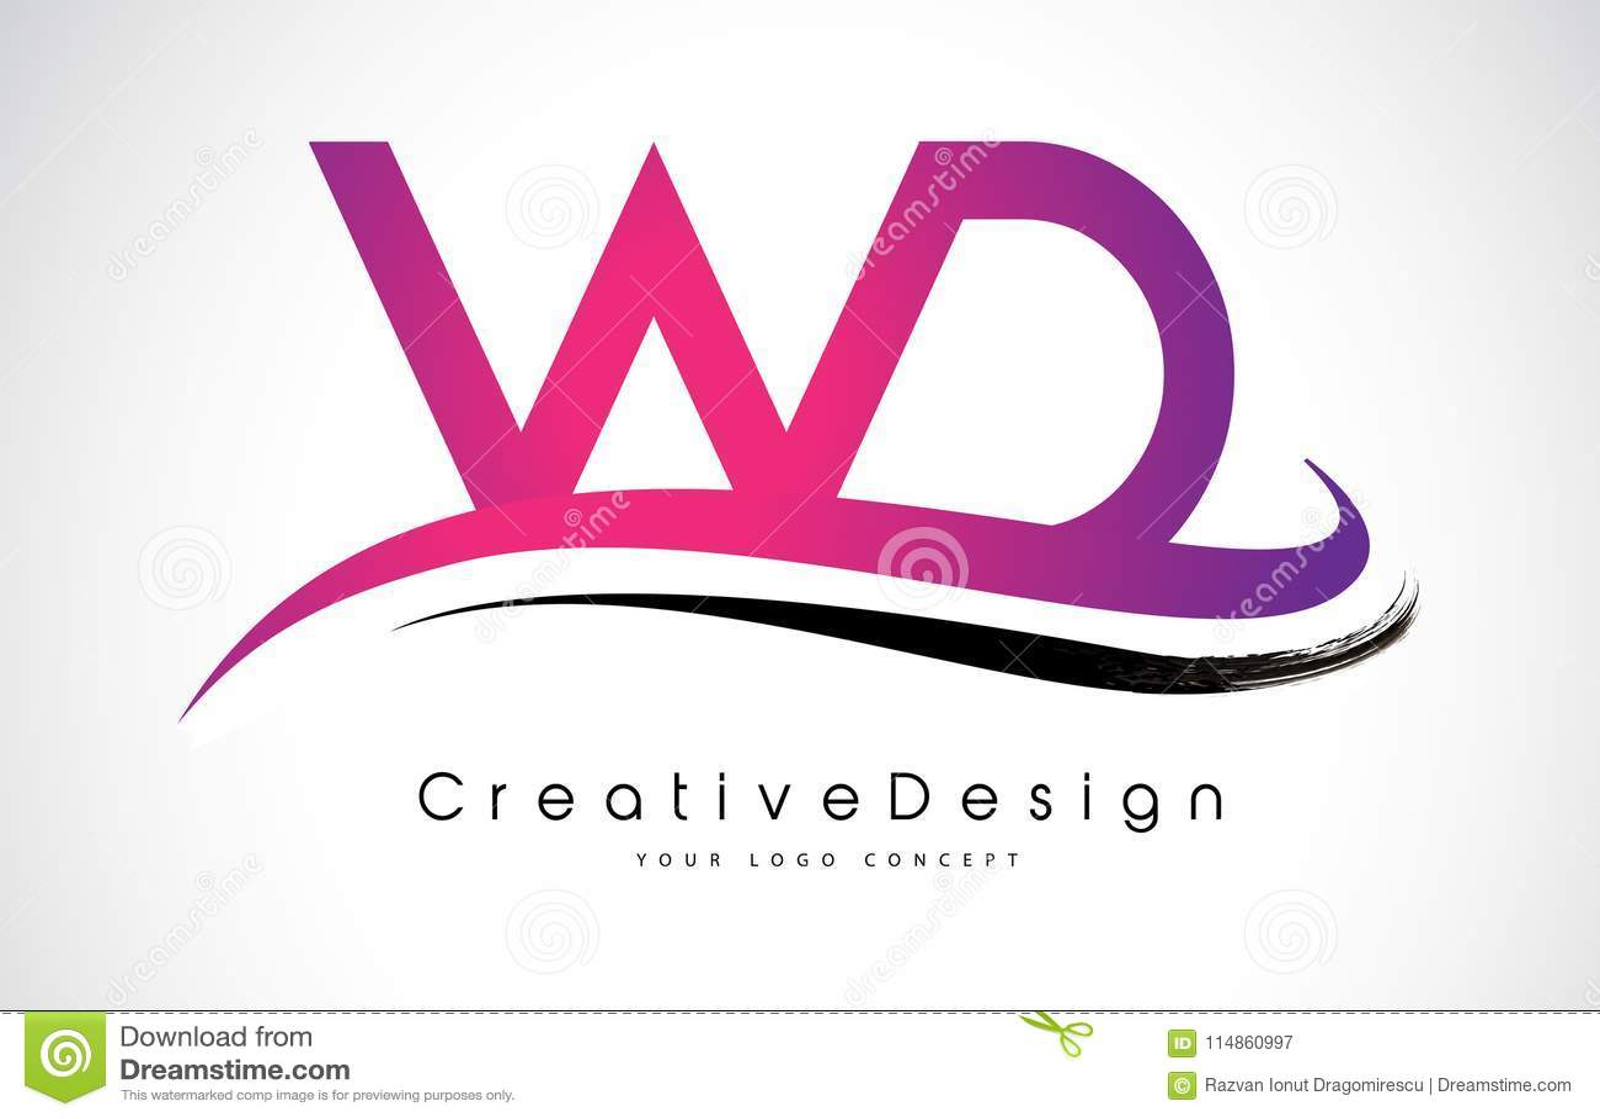 WD W D Letter Logo Design. Creative Icon Modern Letters Vector L ...